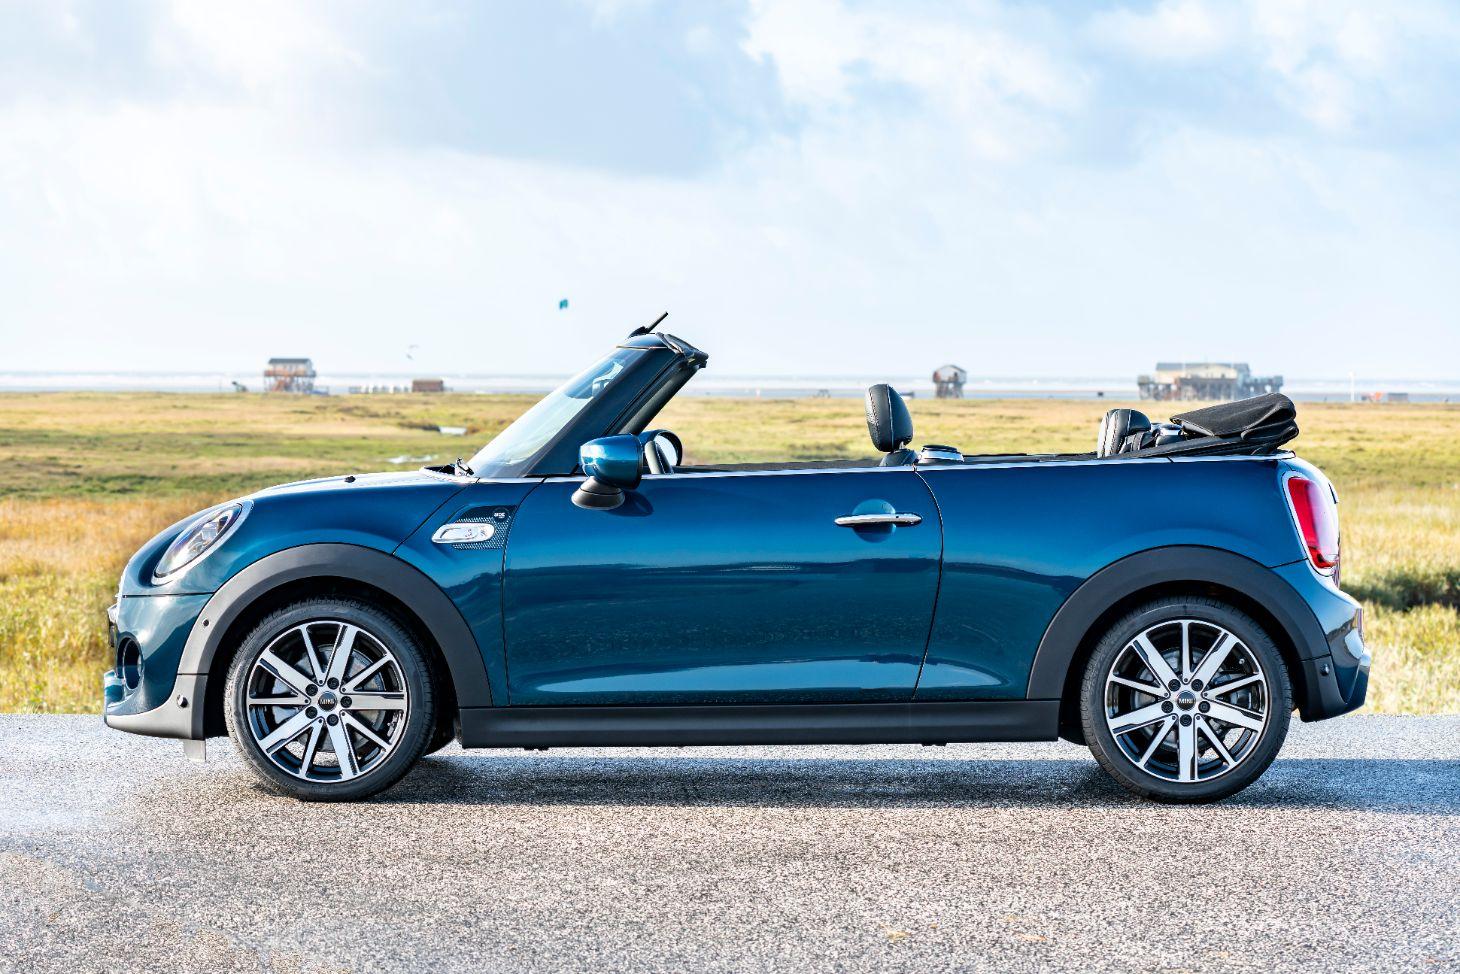 mini cabrio sidewalk azul com teto recolhido visto de lado